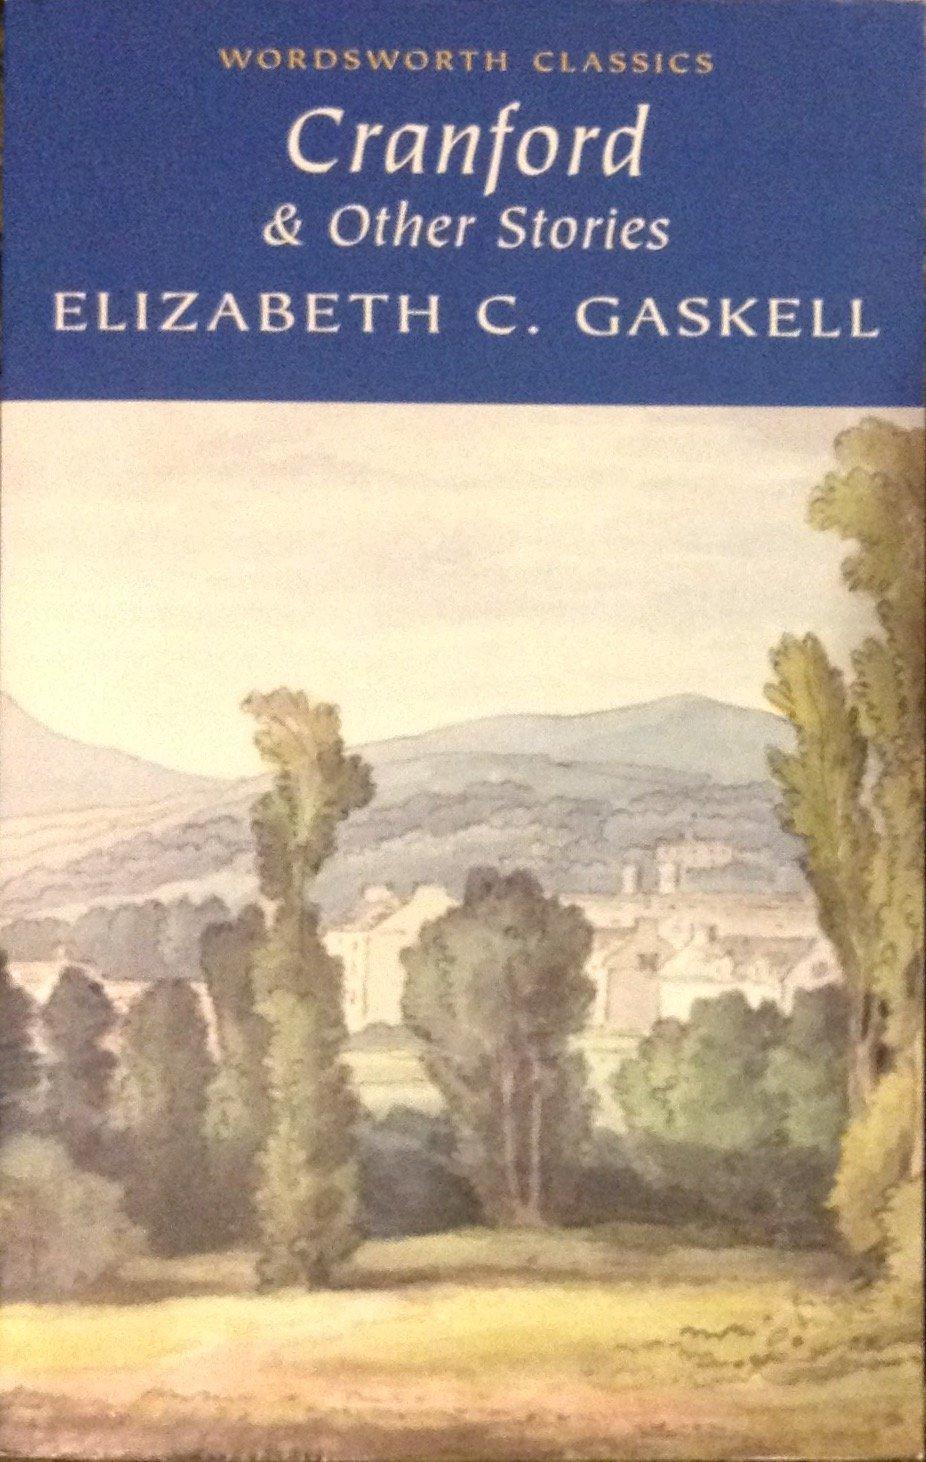 Cranford & Other Stories (Wordsworth Classics) ebook